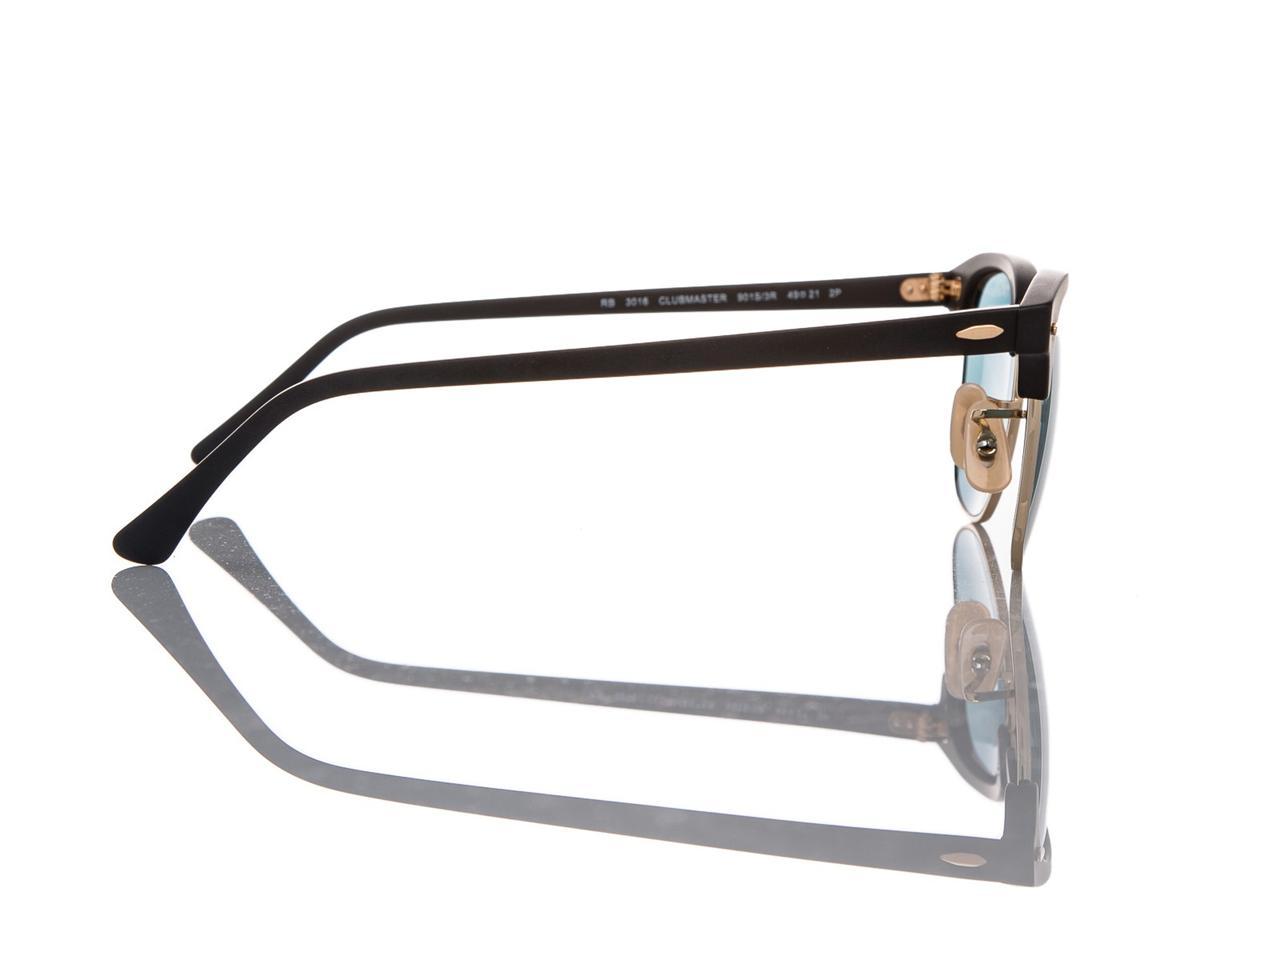 Ray Ban Clubmaster Sunglasses Rb 3016 901s 3r « Heritage Malta 9bc1f33fb8b